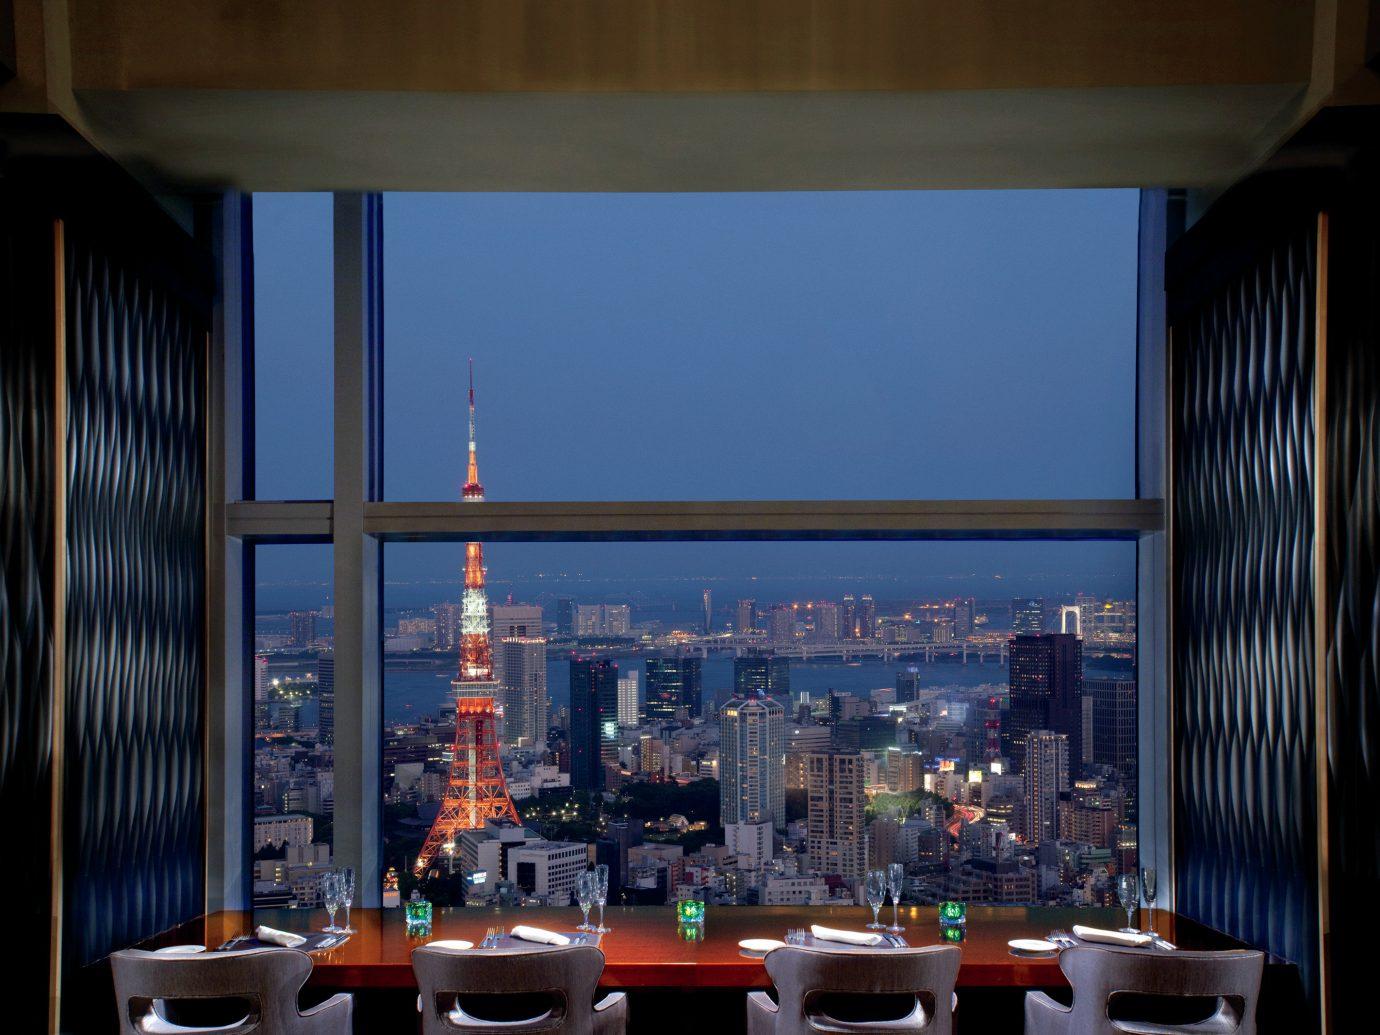 Hotels Romance window indoor room restaurant interior design lighting home Bar Design window covering living room